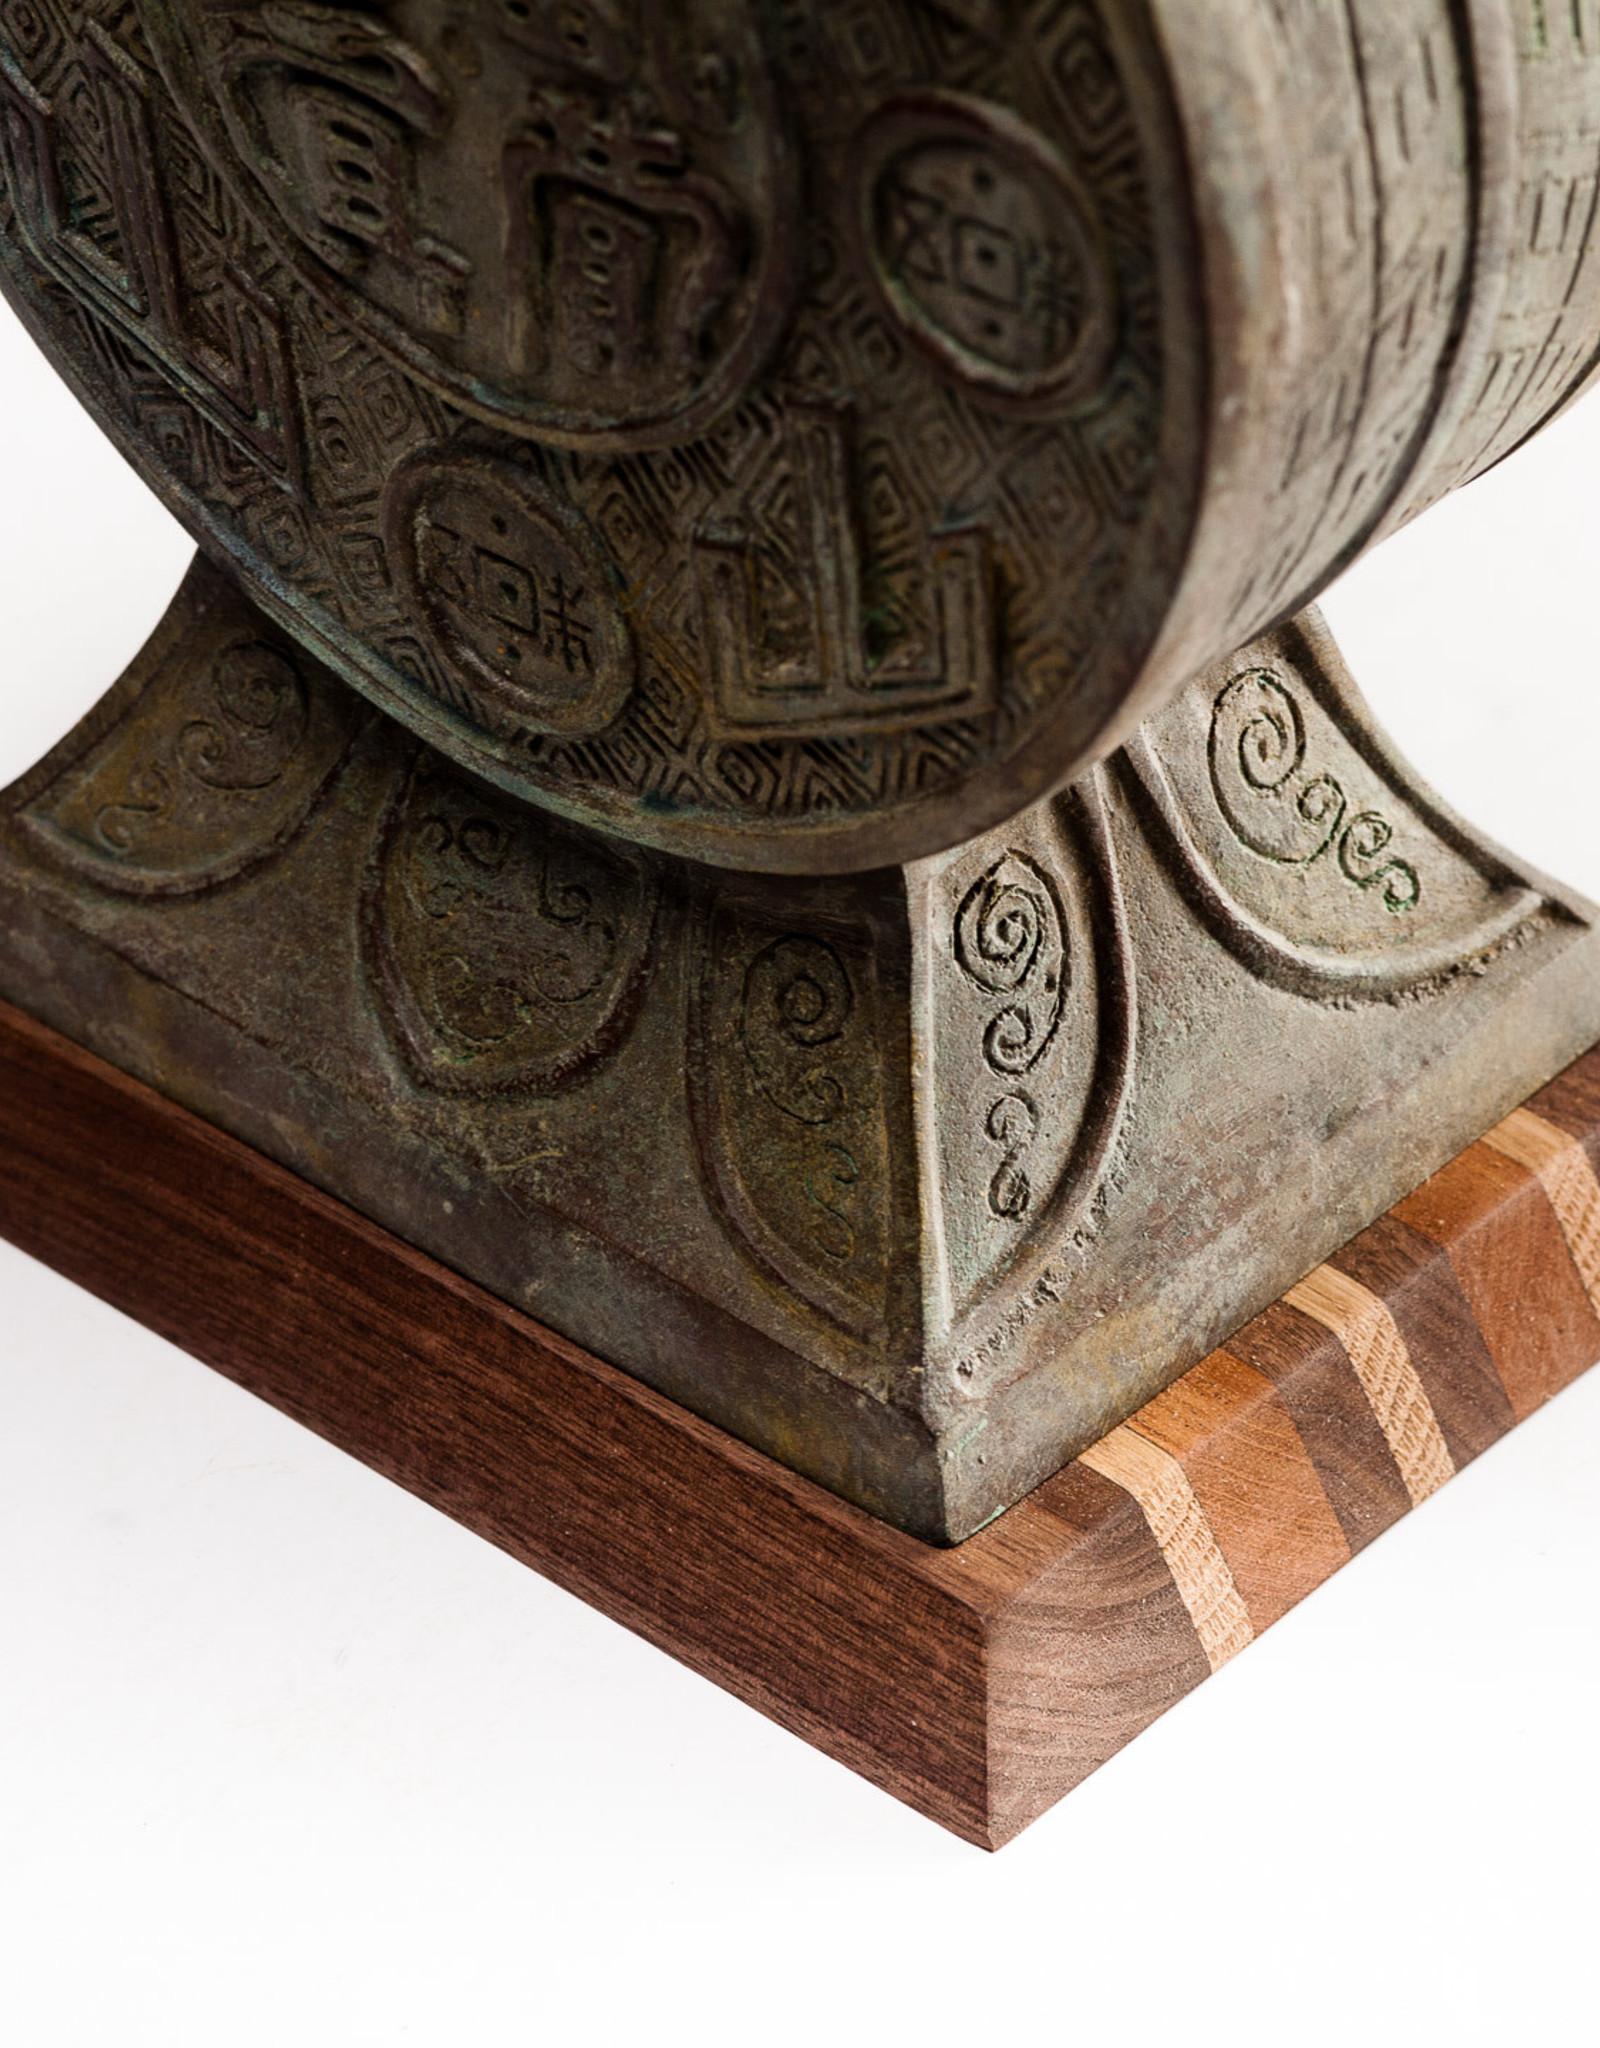 Lawrence & Scott Emersyn Table Lamp in Archaic Bronze